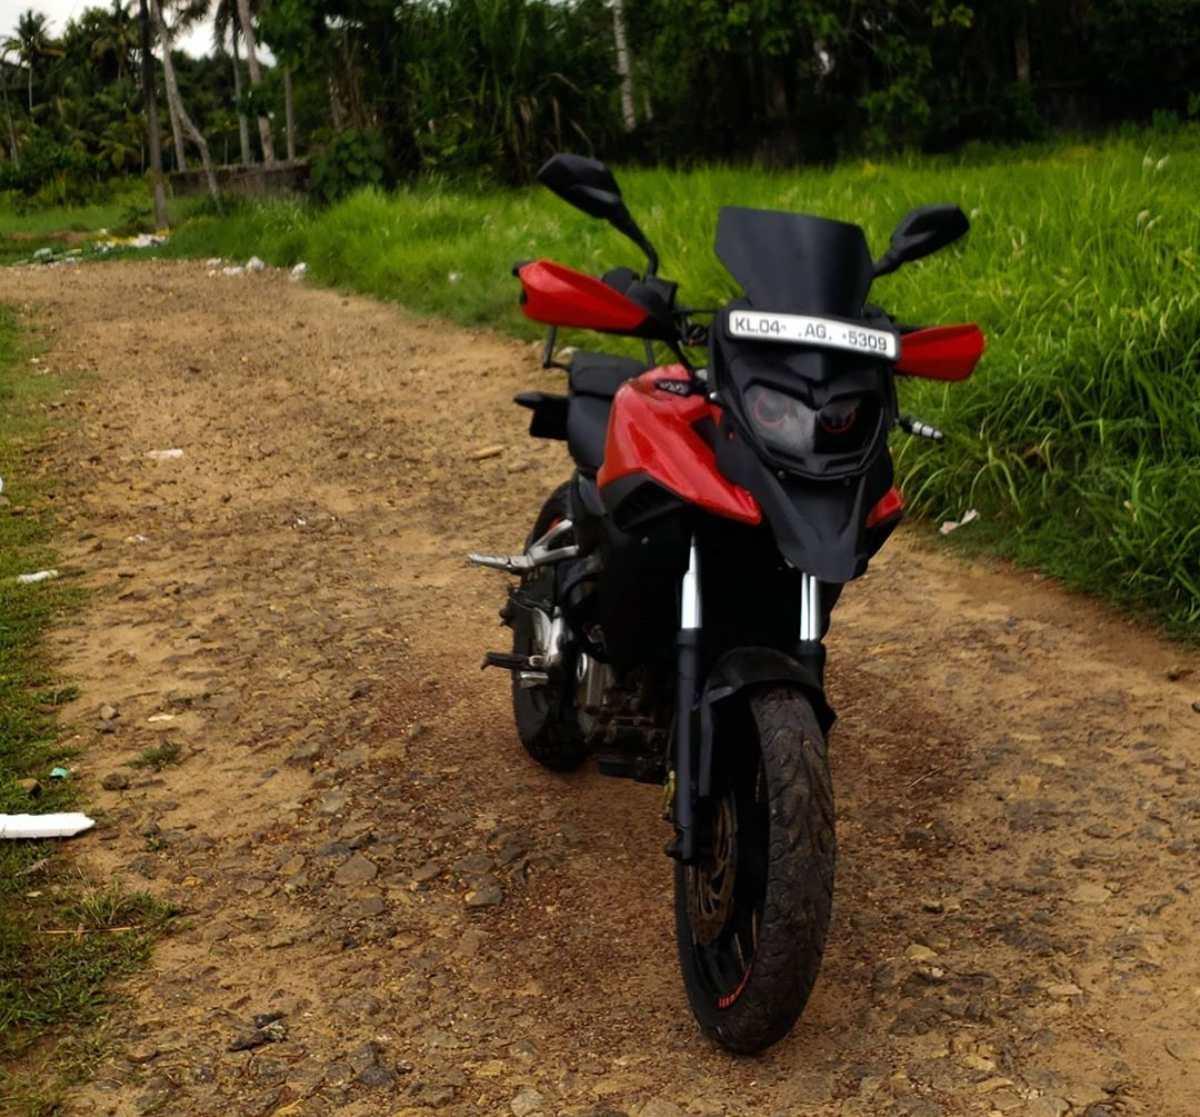 Bajaj Pulsar NS 200 modified